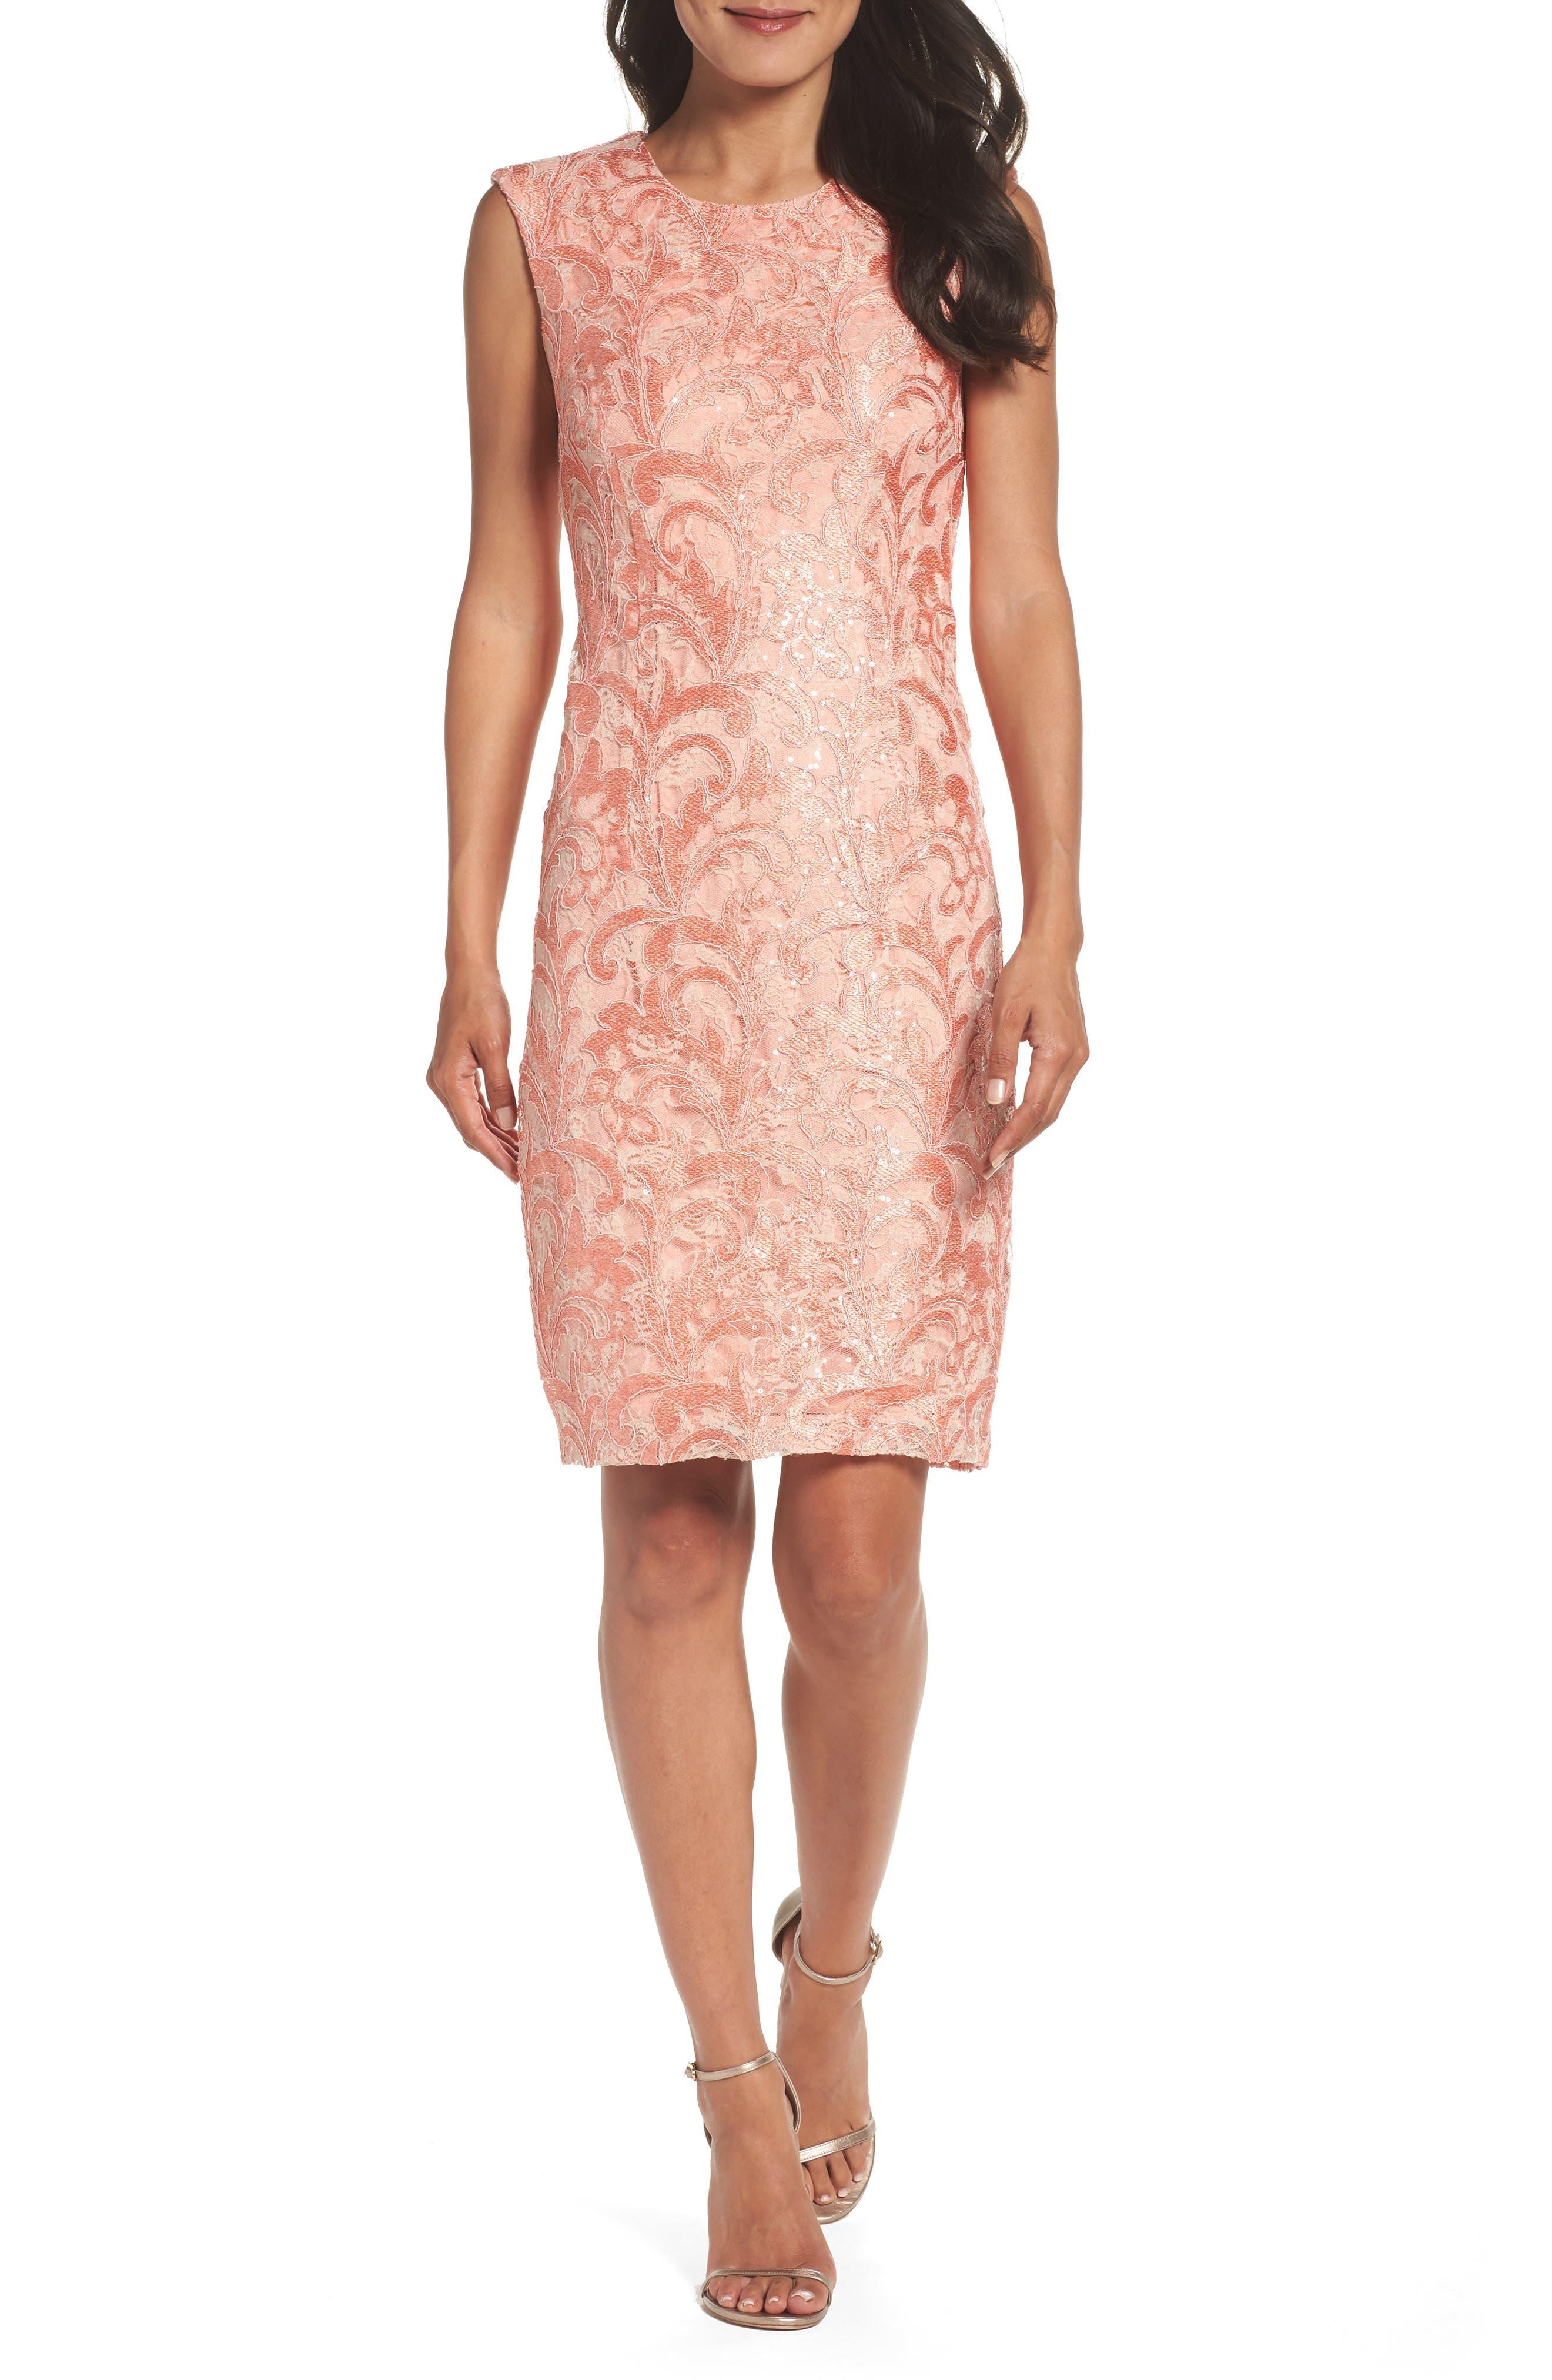 Alternate Image 1 Selected - Chetta B Sequin Lace Sheath Dress